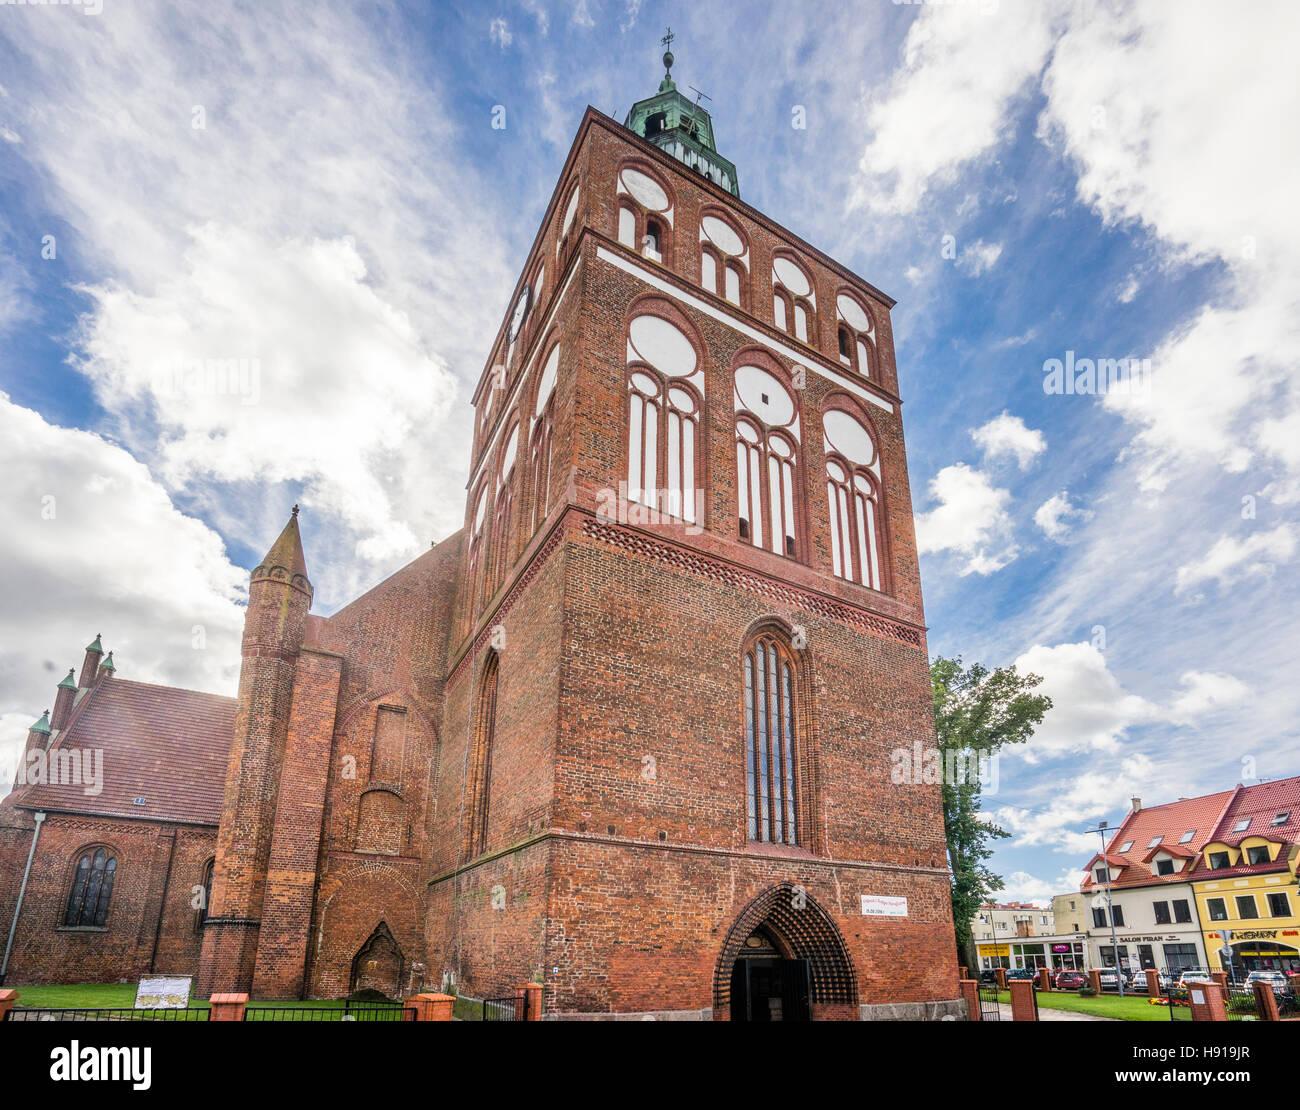 Poland, West Pomerania, Gryfice (Greifenberg), Brick Gothic St. Mary of the Assumption Church - Stock Image